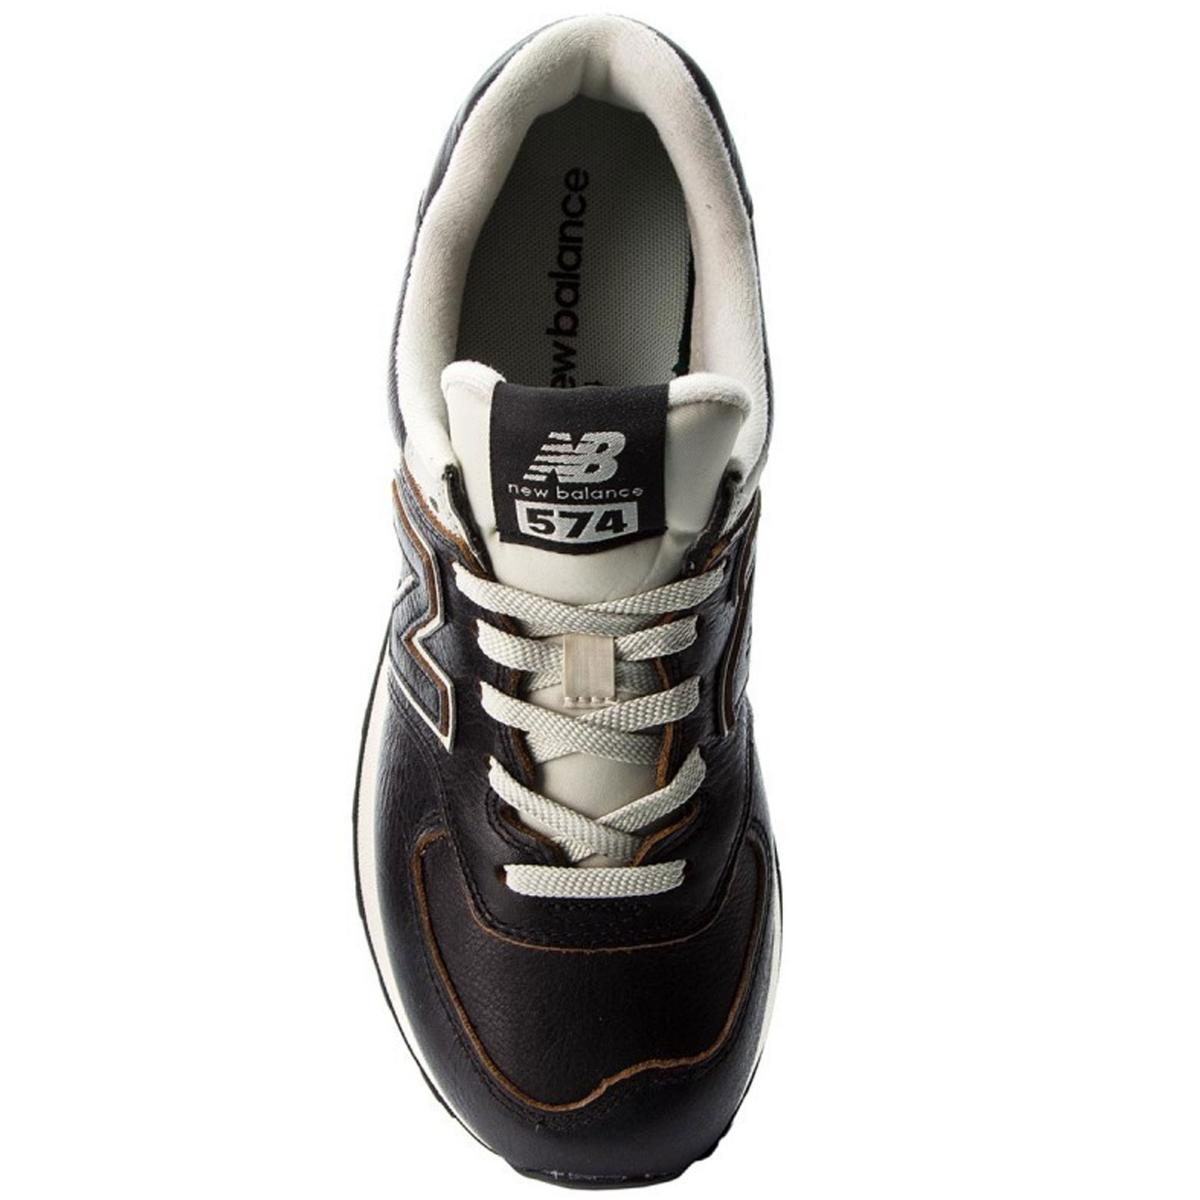 Scarpe Sneakers New Balance da uomo rif. ML574LPK